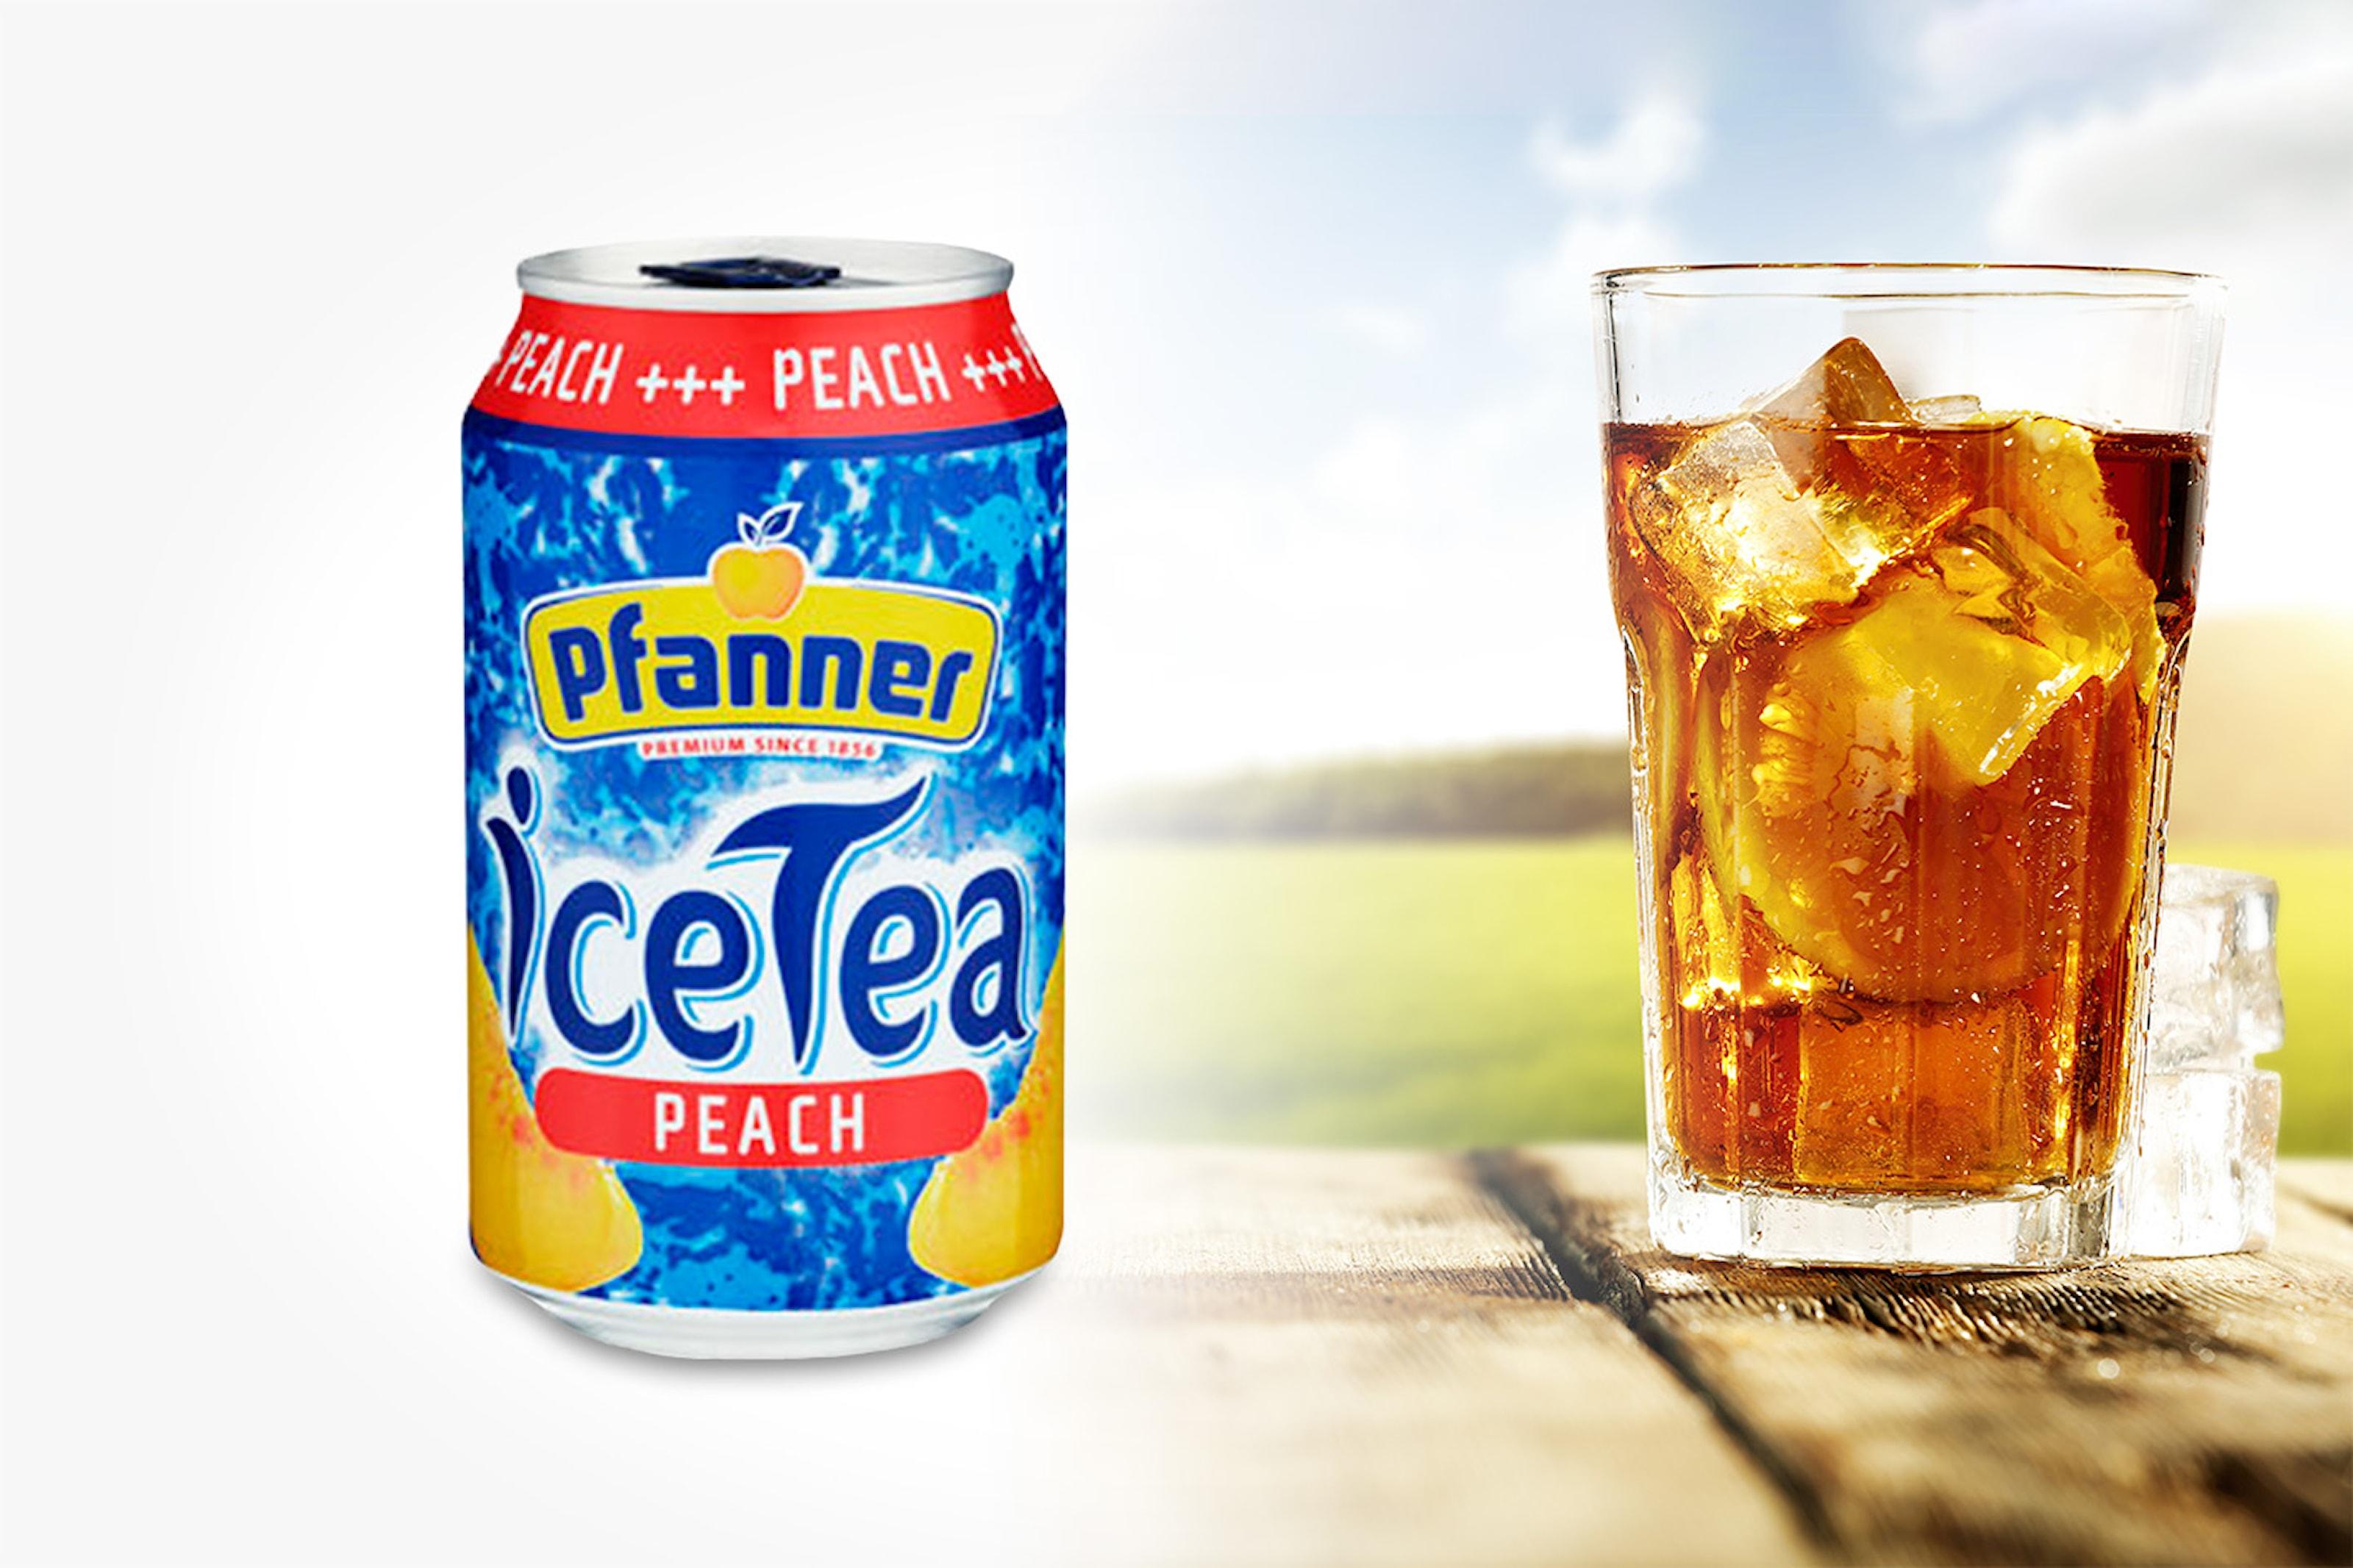 Pfanner Ice Tea Peach, 24-pack inkl. pant